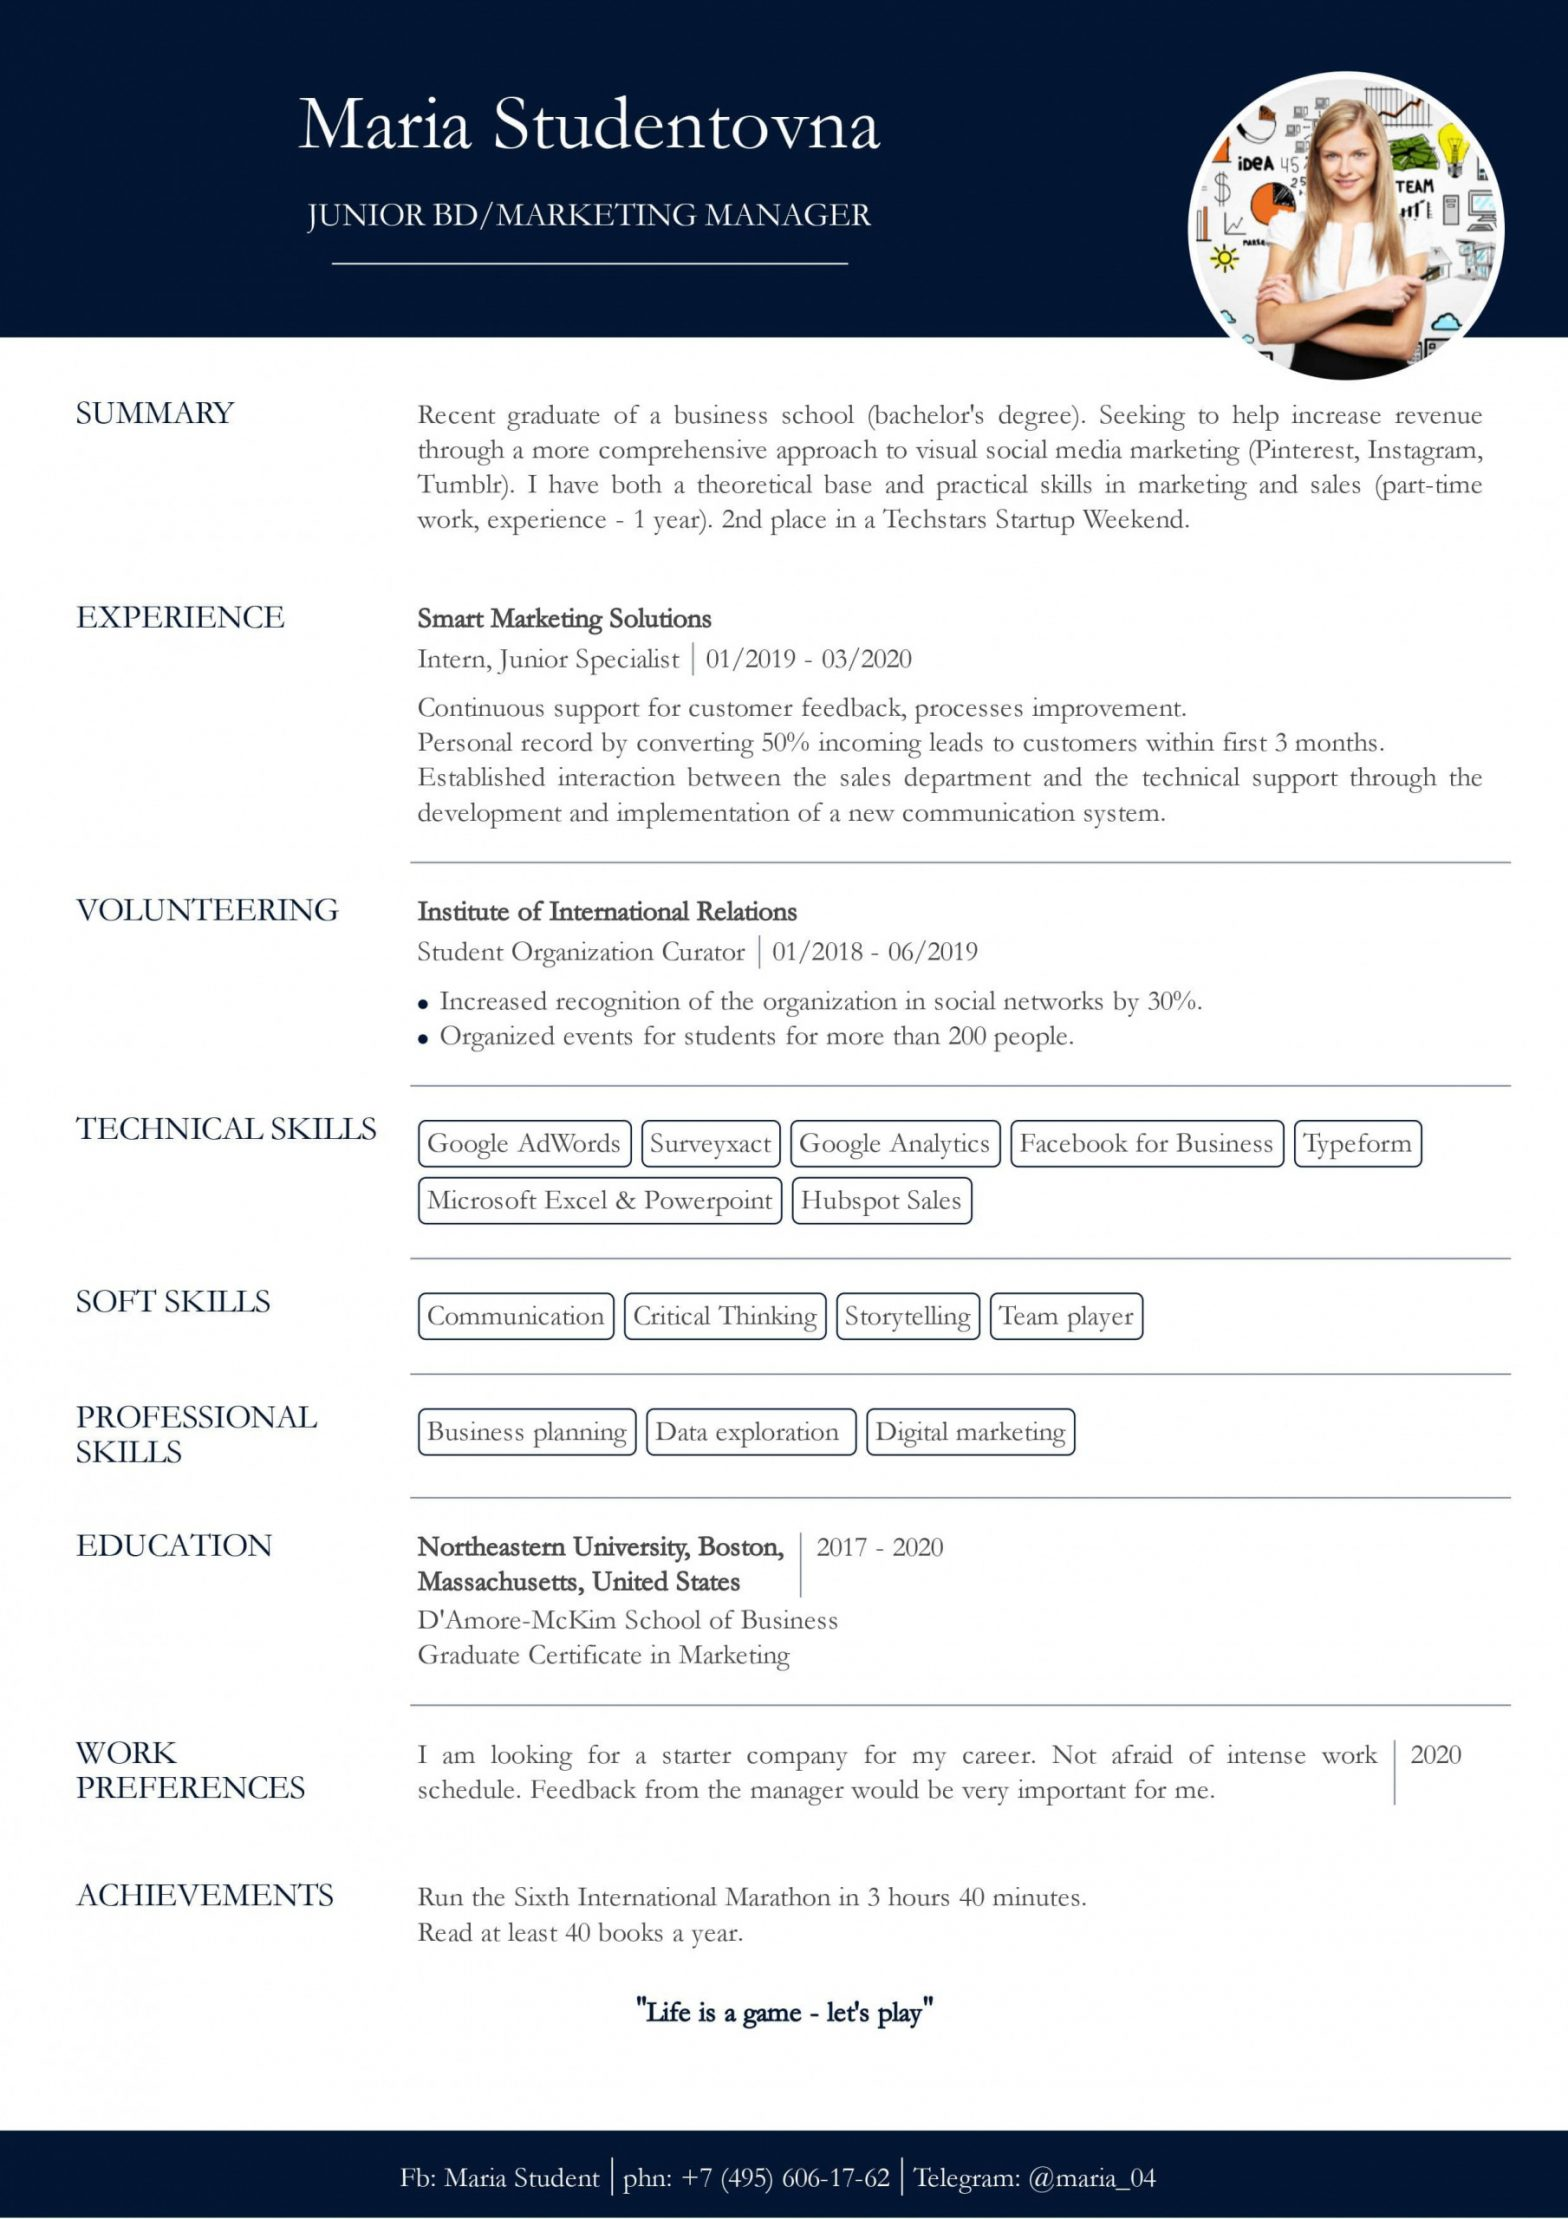 Resume Sample for Internship with No Experience Resume with No Work Experience. Sample for Students. - Cv2you Blog